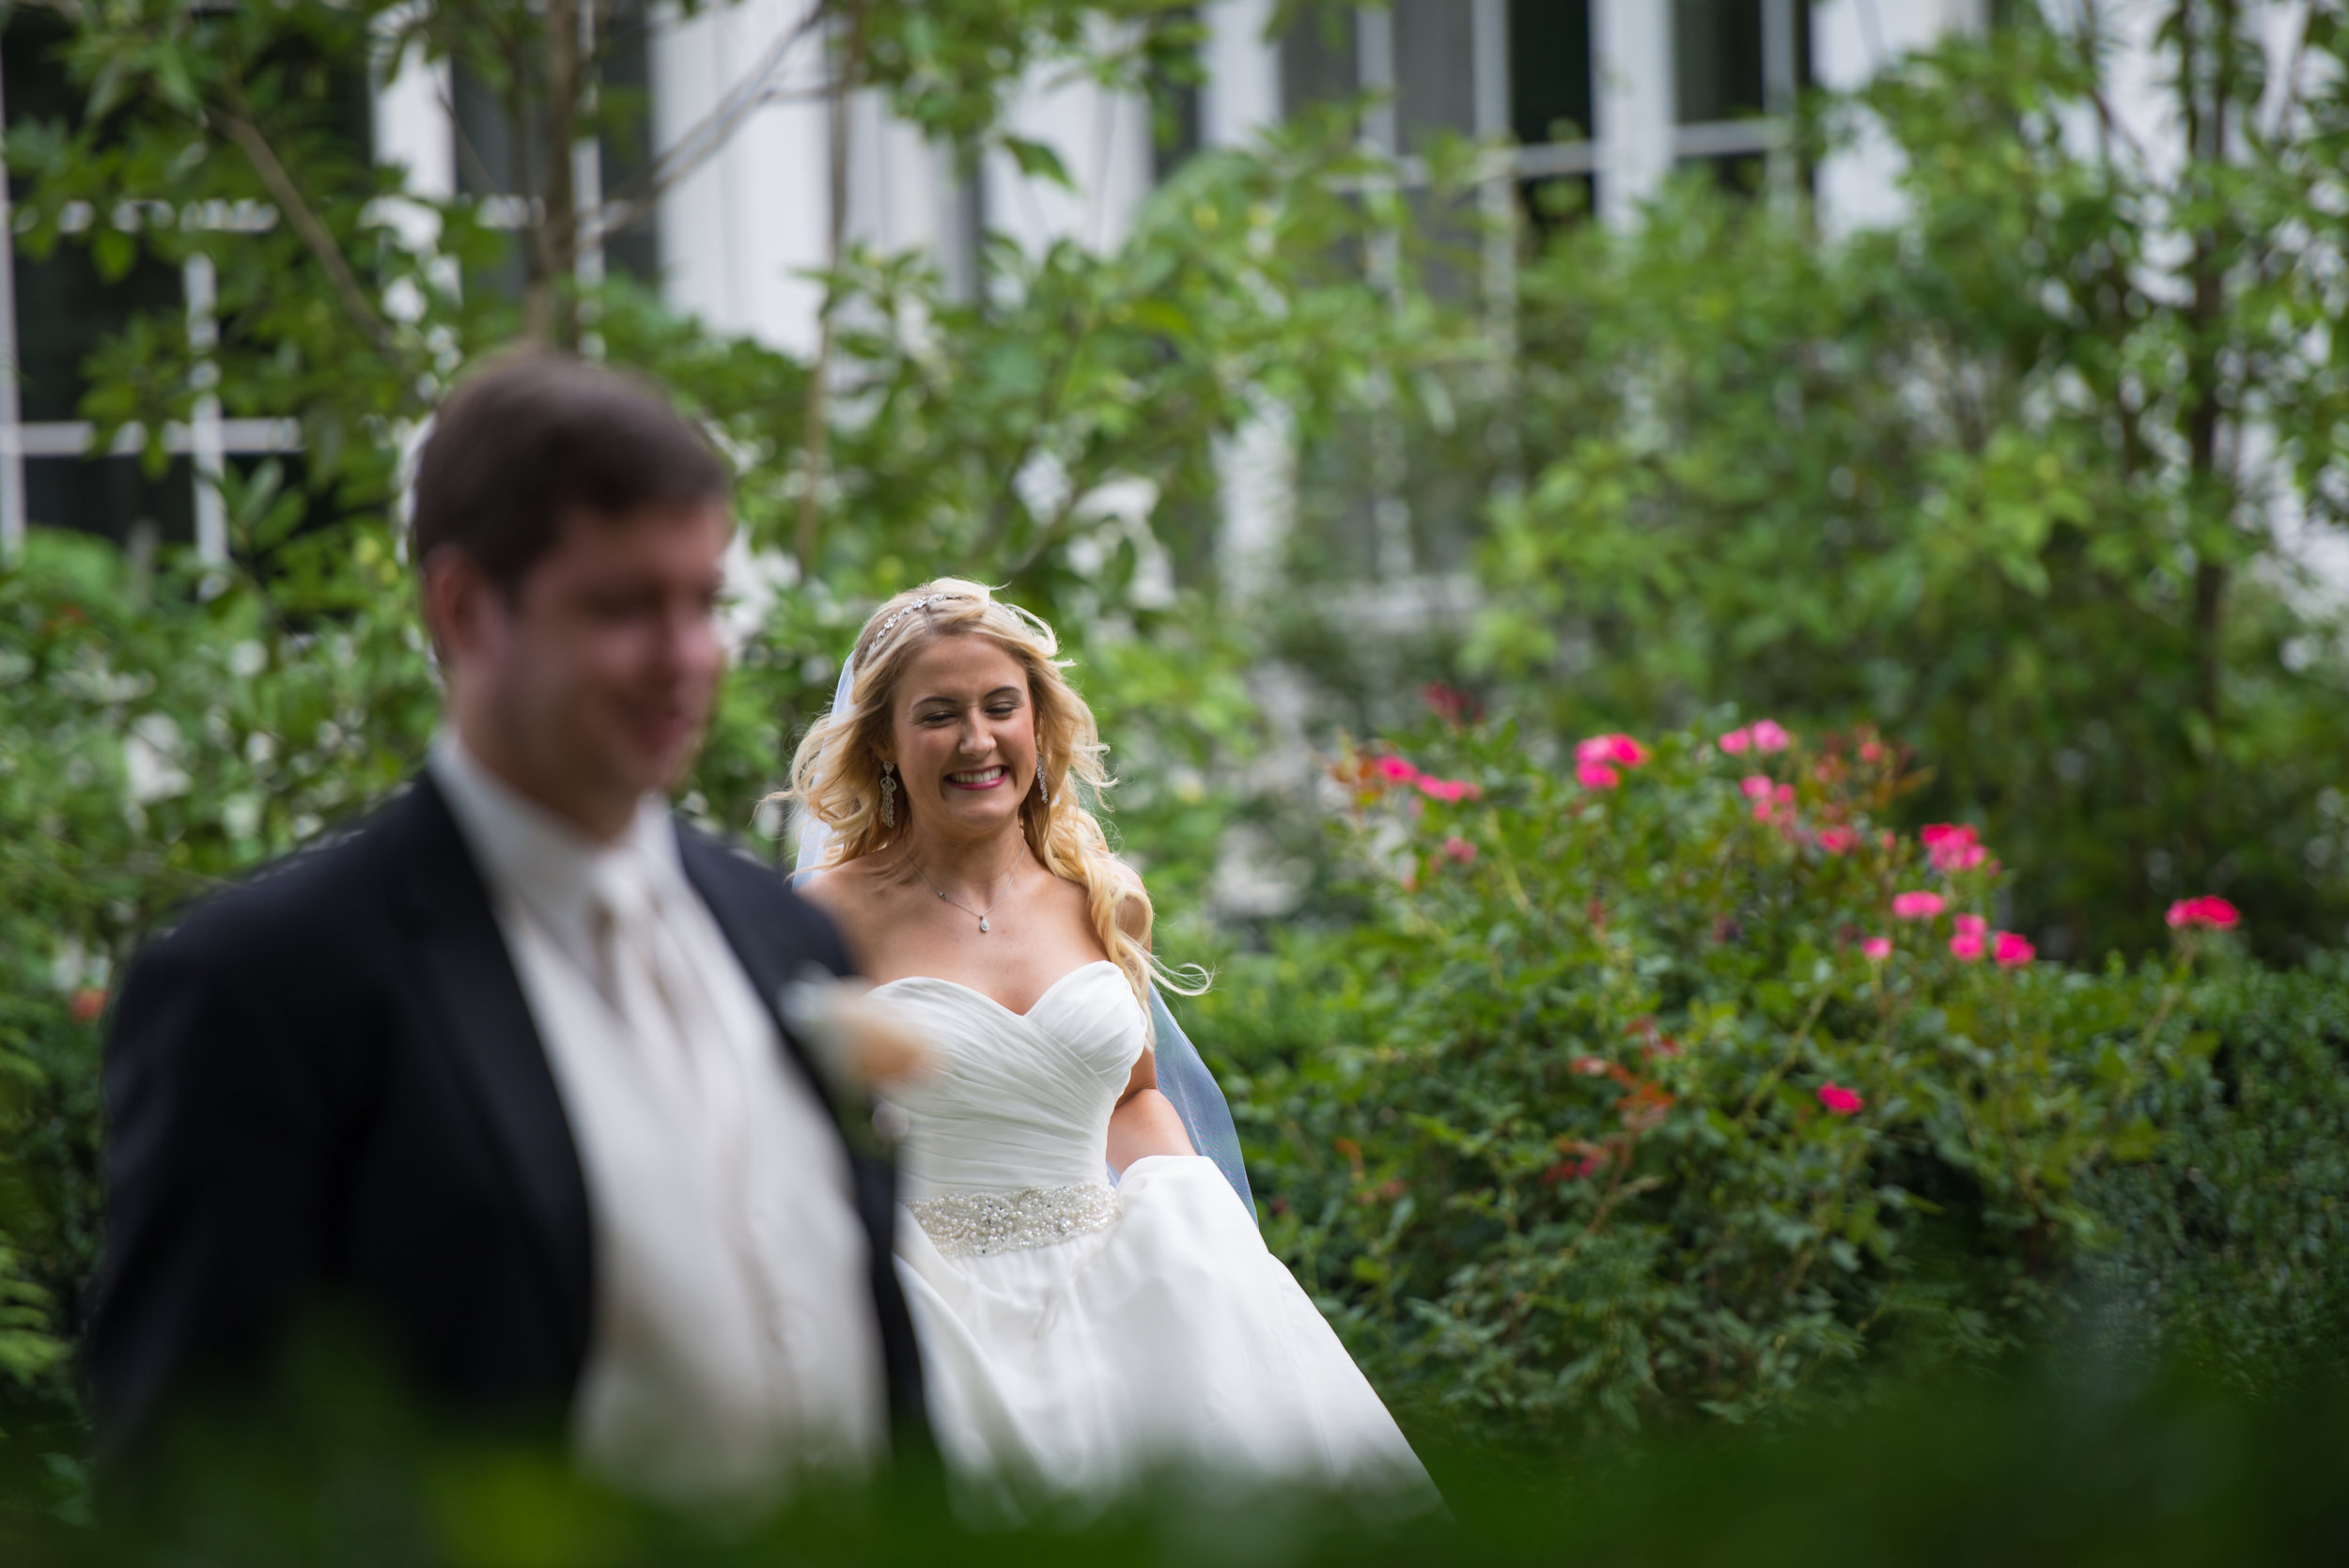 Wedding First Look Photos00917.jpg